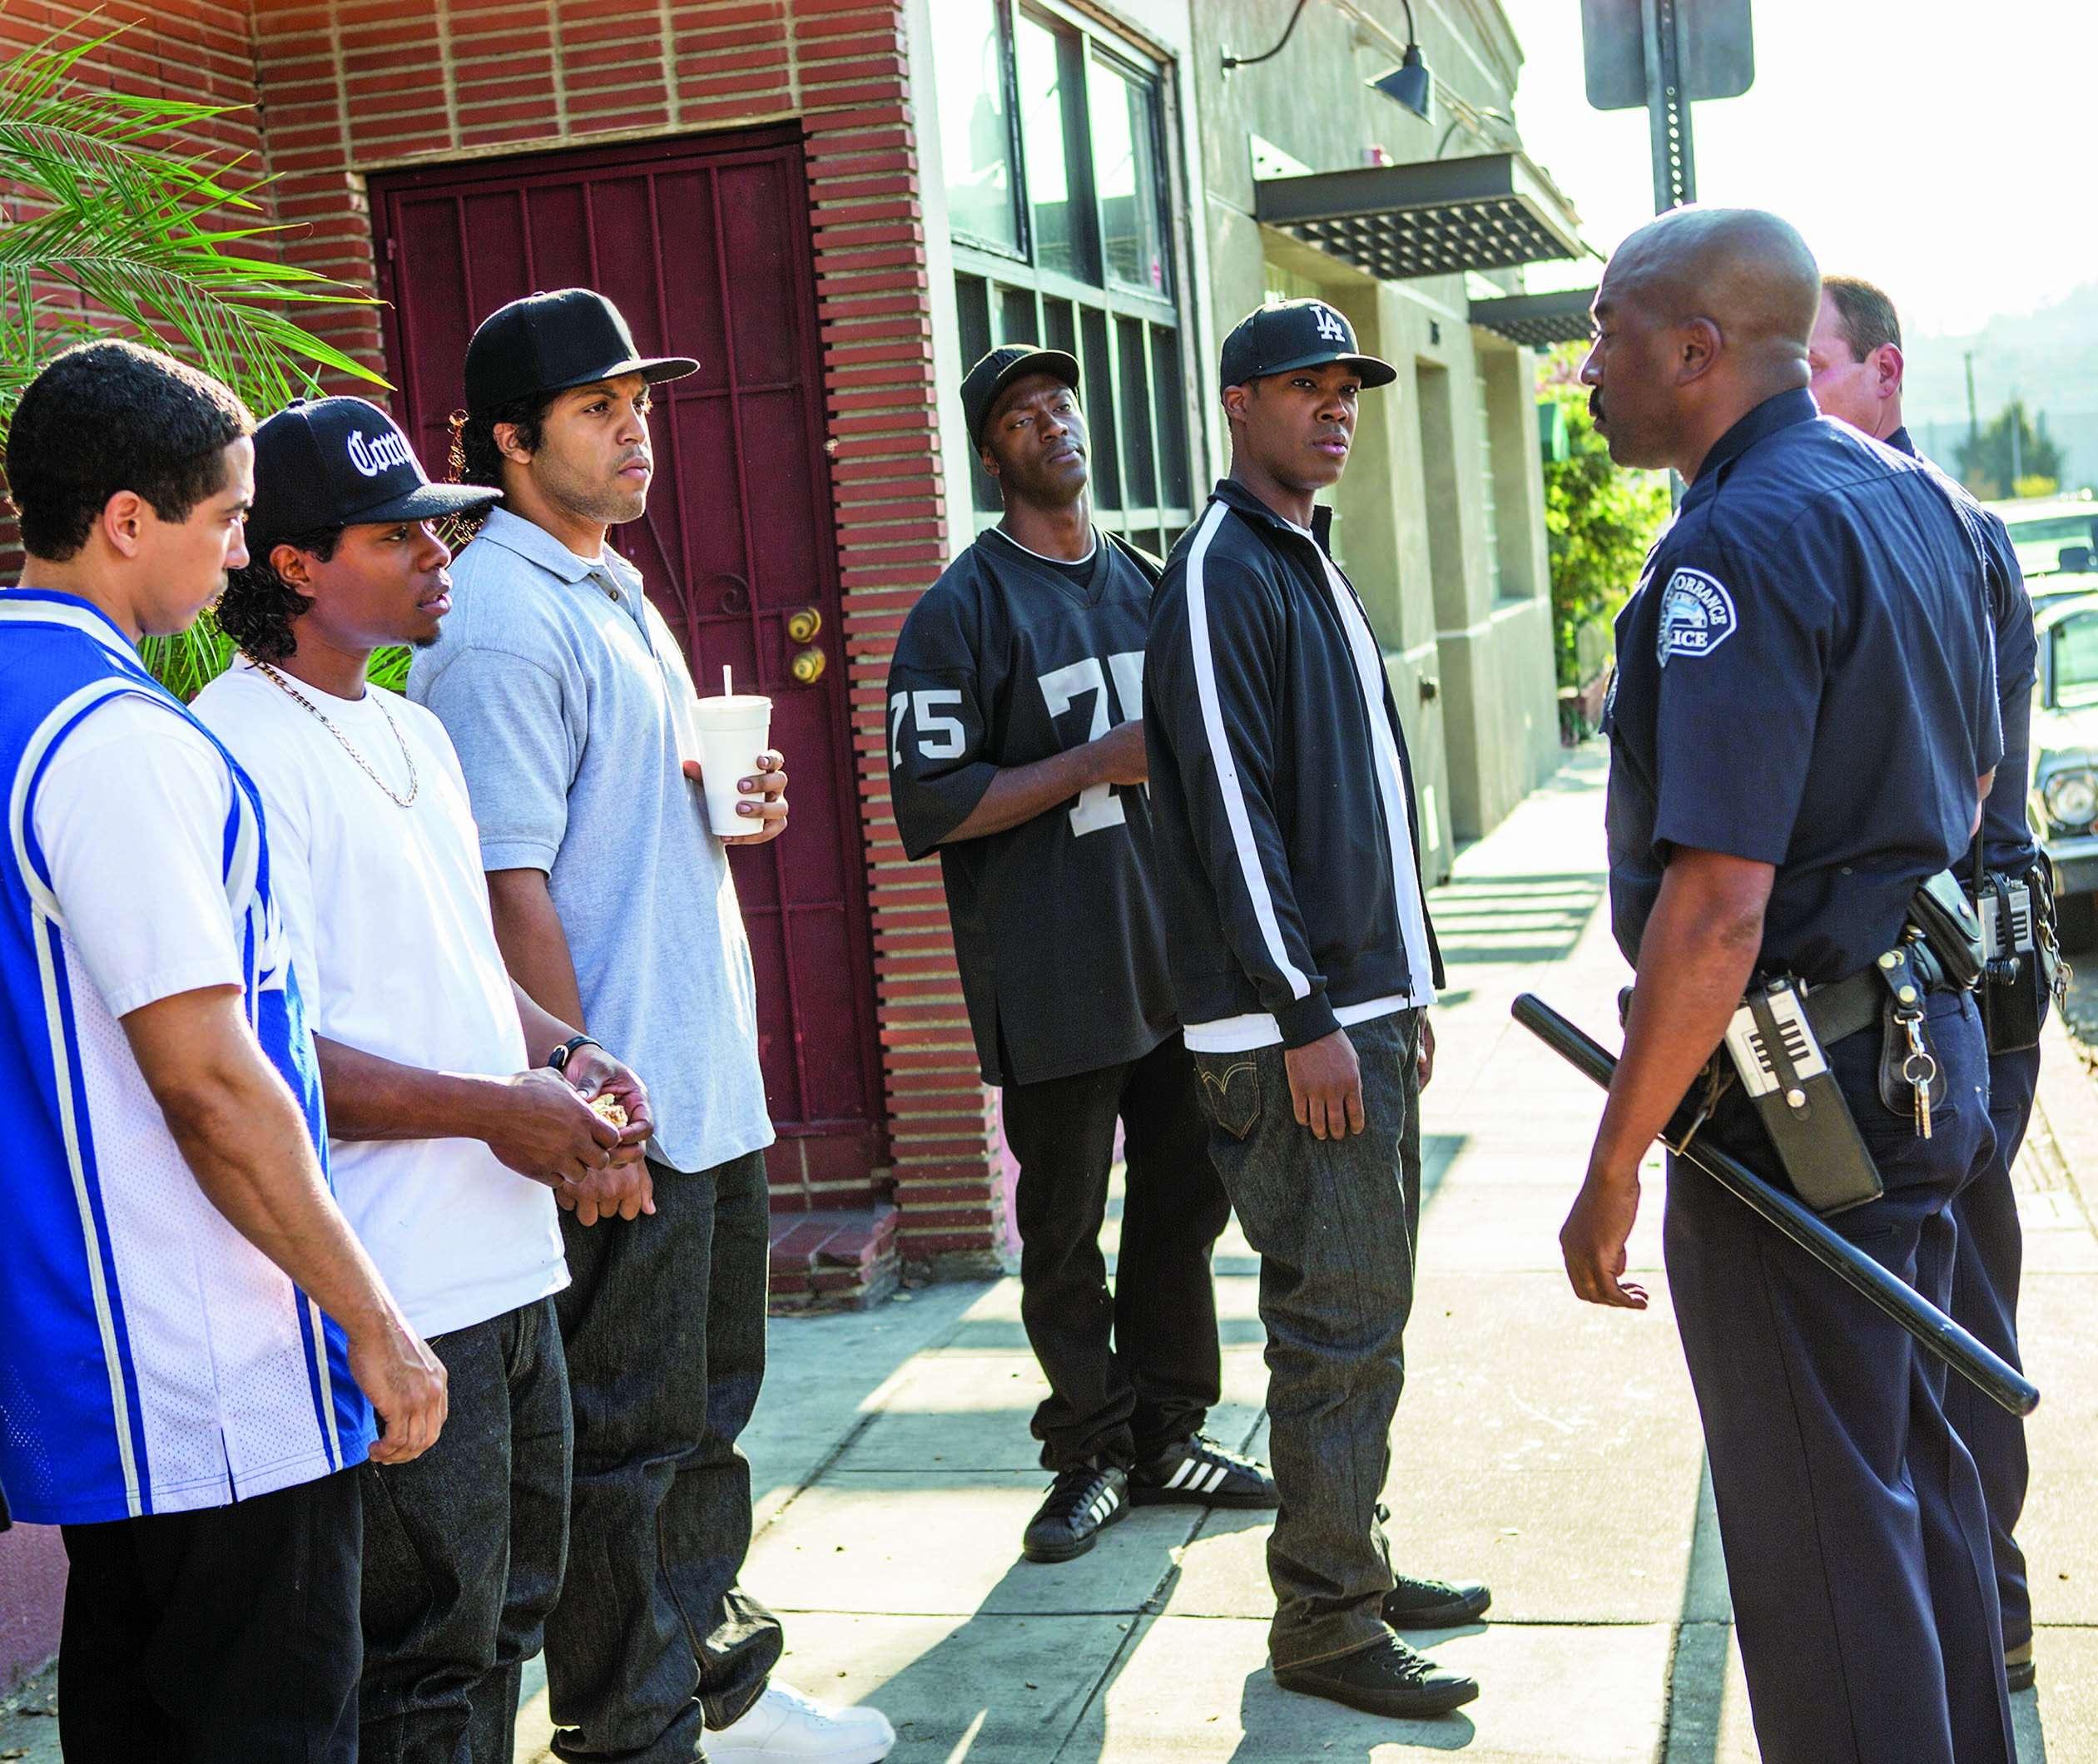 A scene from Straight Outta Compton